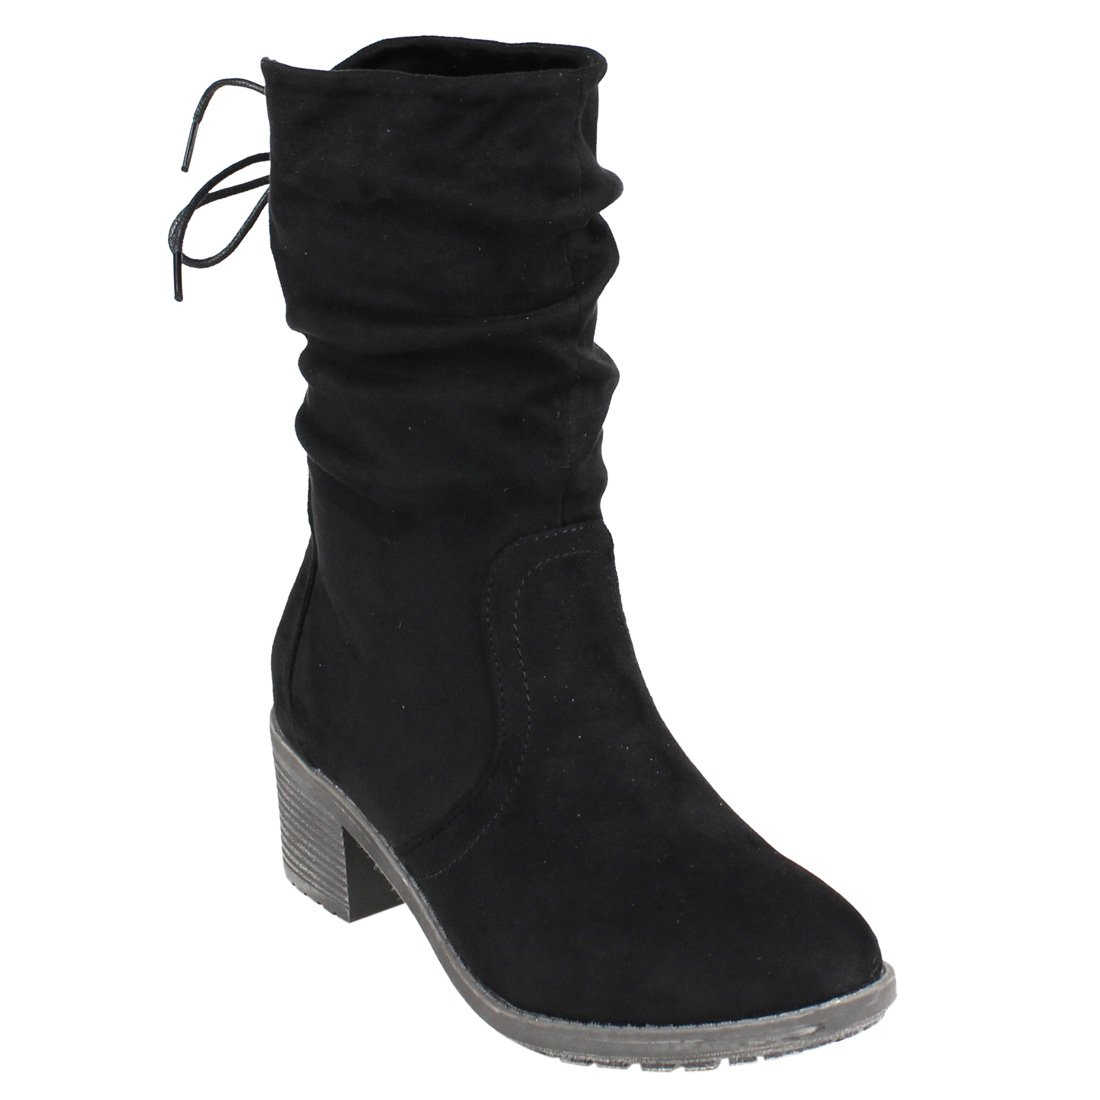 96313b9e3f9 BESTON FM31 Women's Back Lace Side Zipper Stacked Heel Mid-Calf Slouchy  Boots